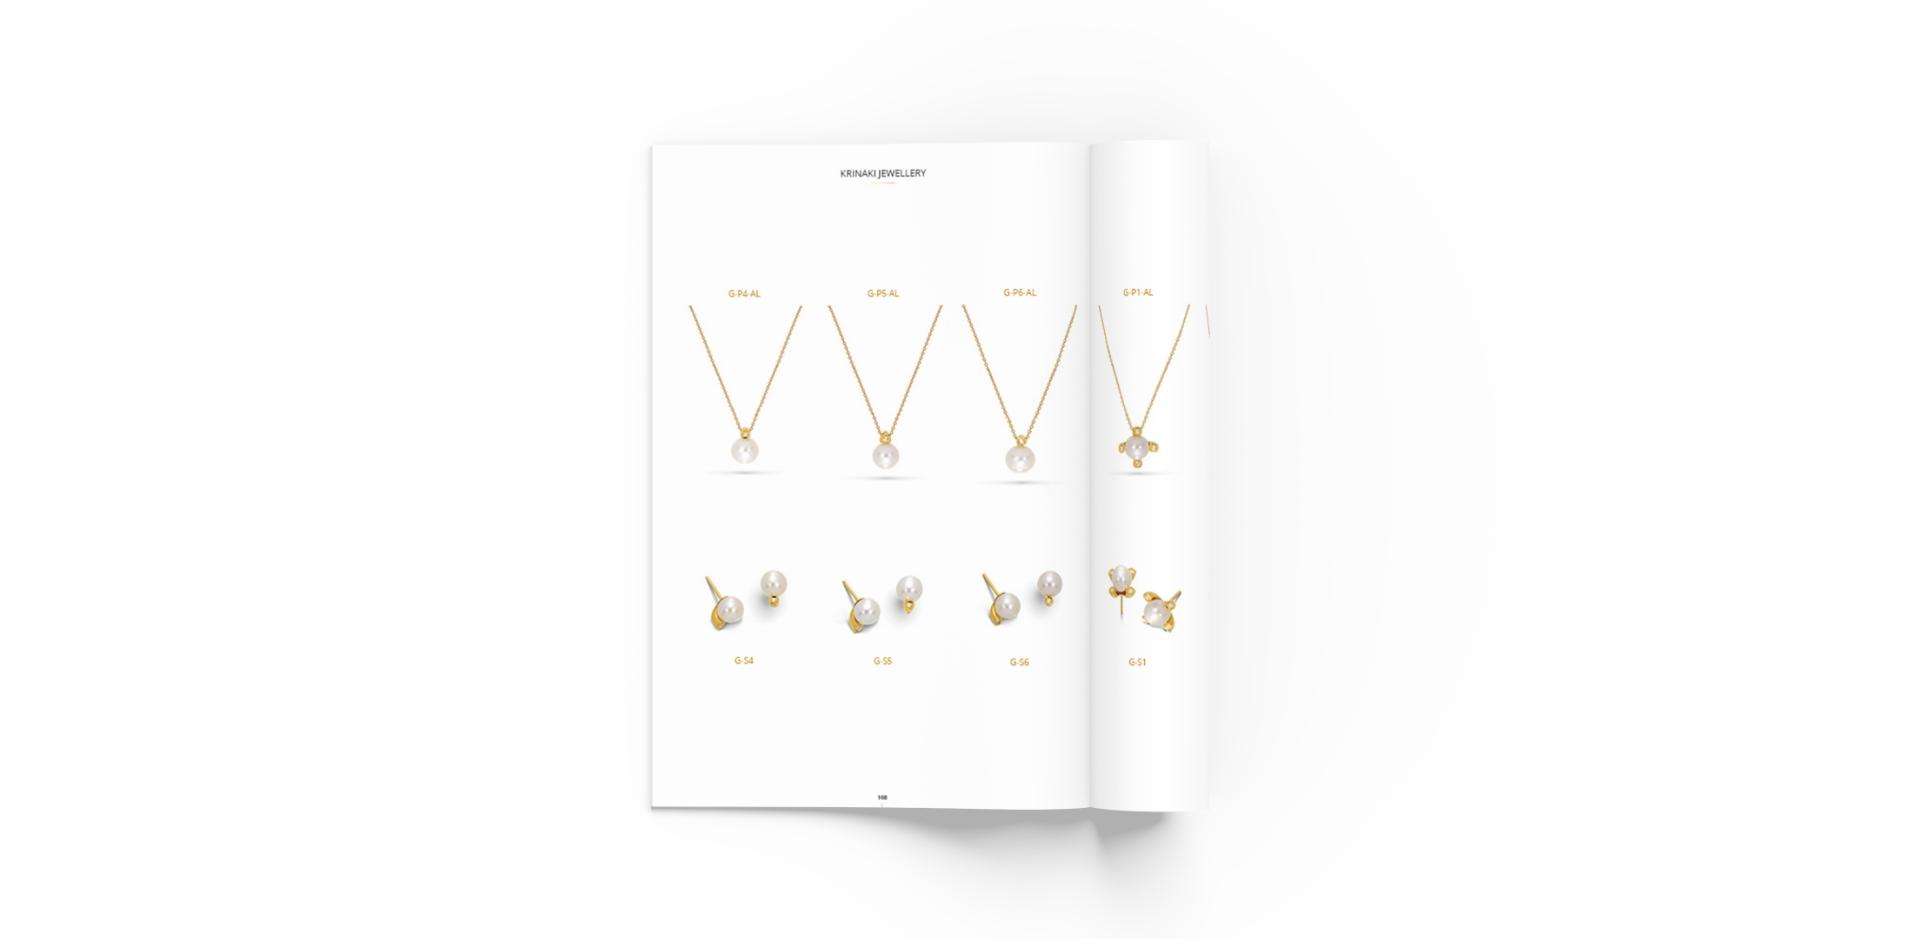 Krinaki lookbook design